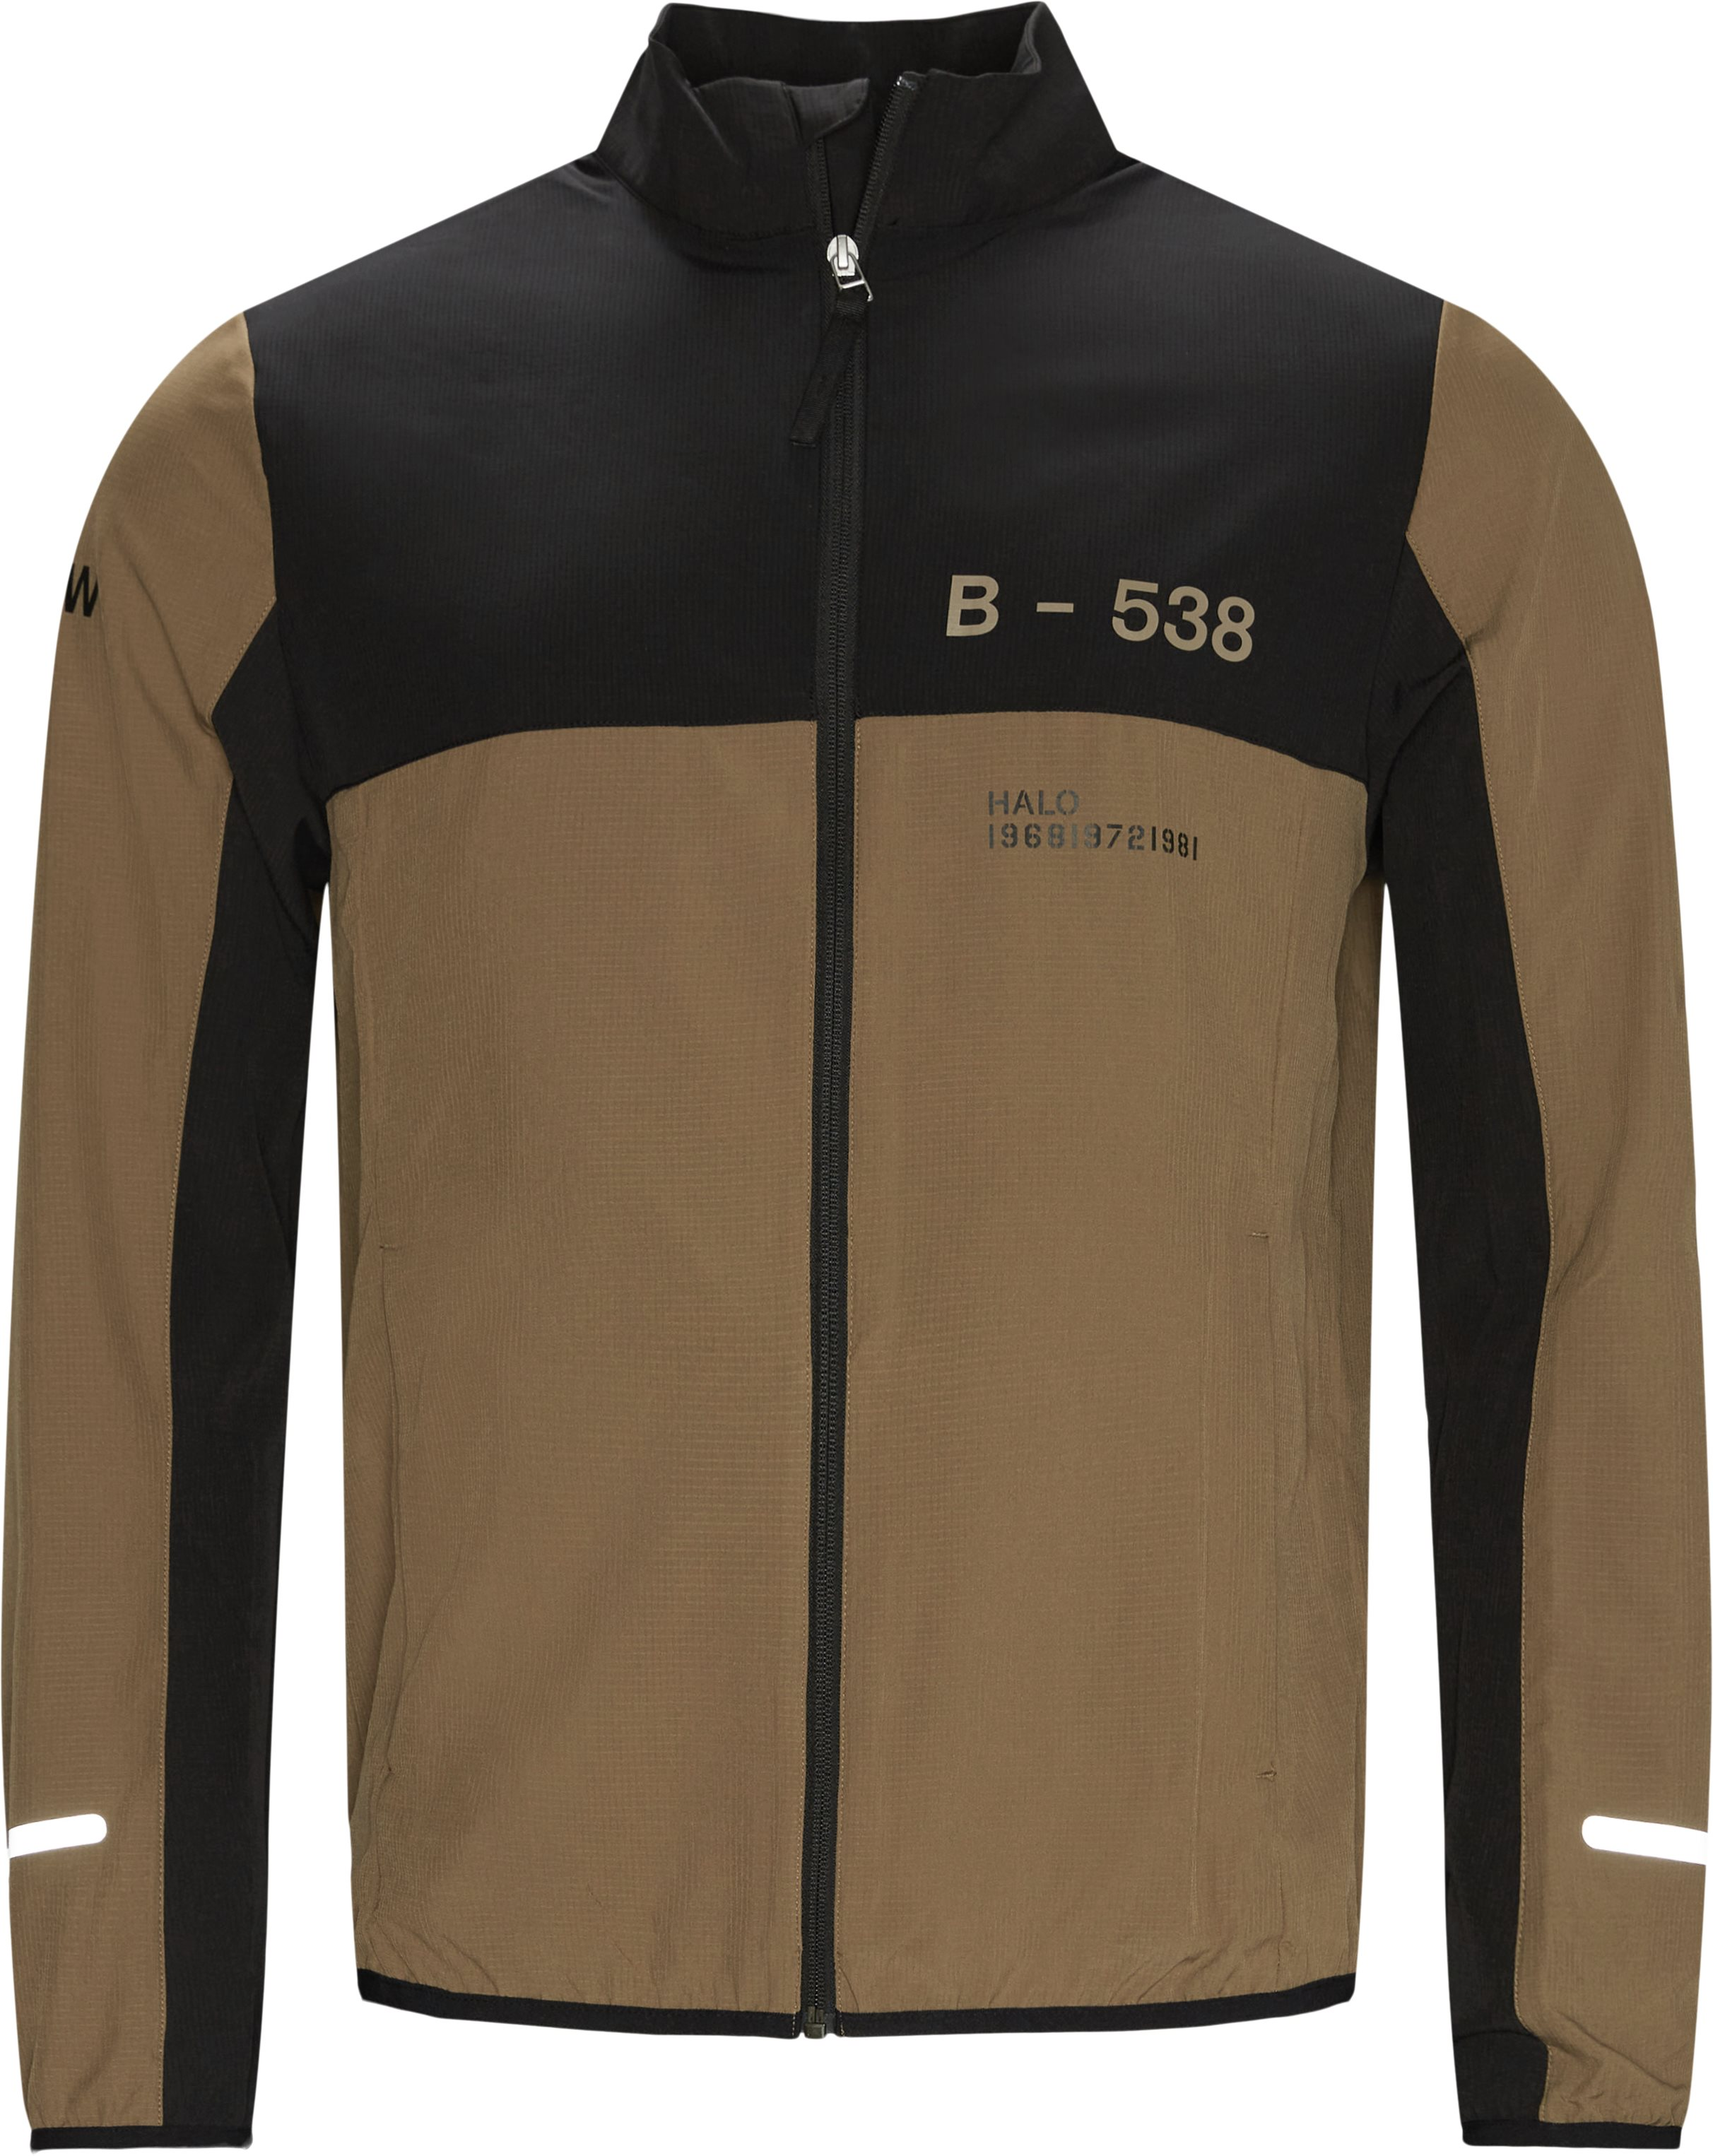 Tech Jacket  - Sweatshirts - Regular fit - Sand